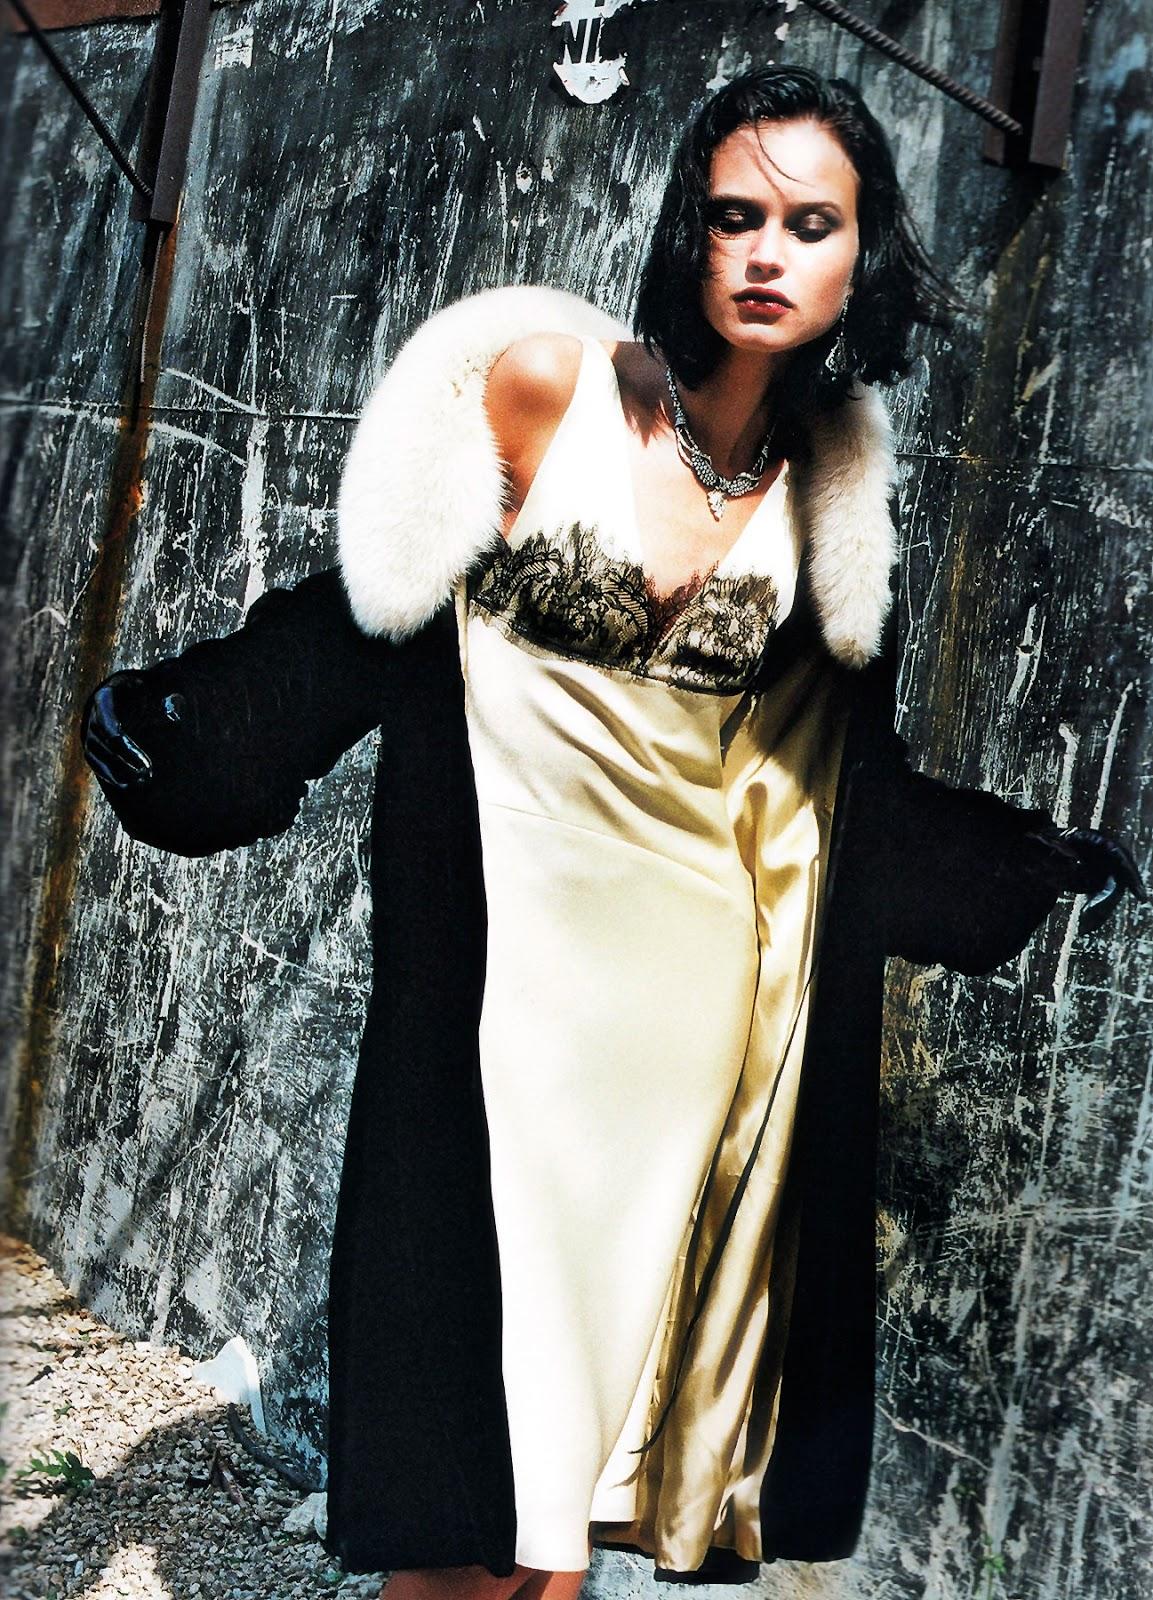 Natalia Semanova by Helmut Newton for Blumarine Fall/Winter 1999 campaign